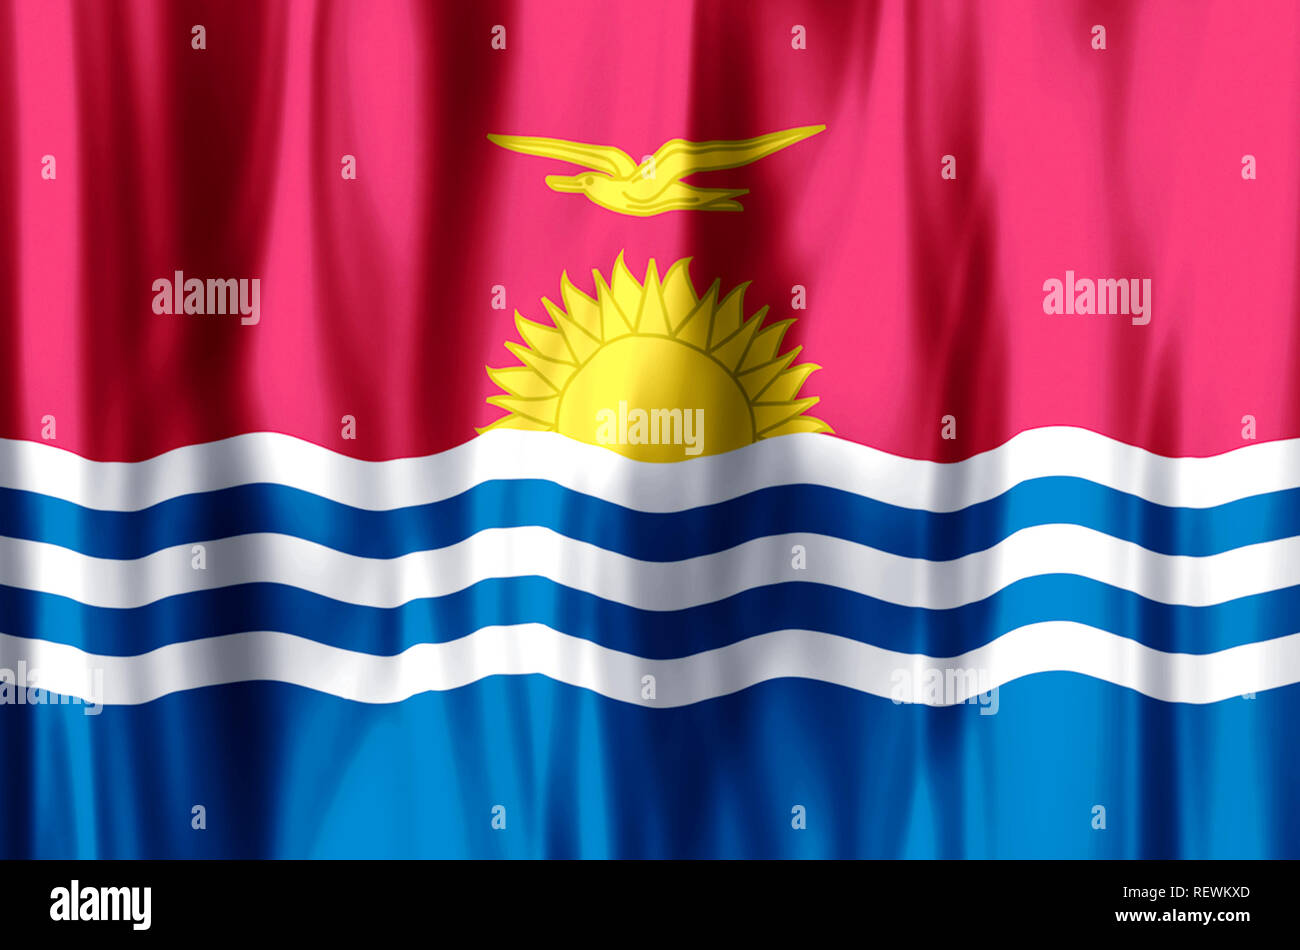 Kiribati stylish waving and closeup flag illustration. Perfect for background or texture purposes. - Stock Image